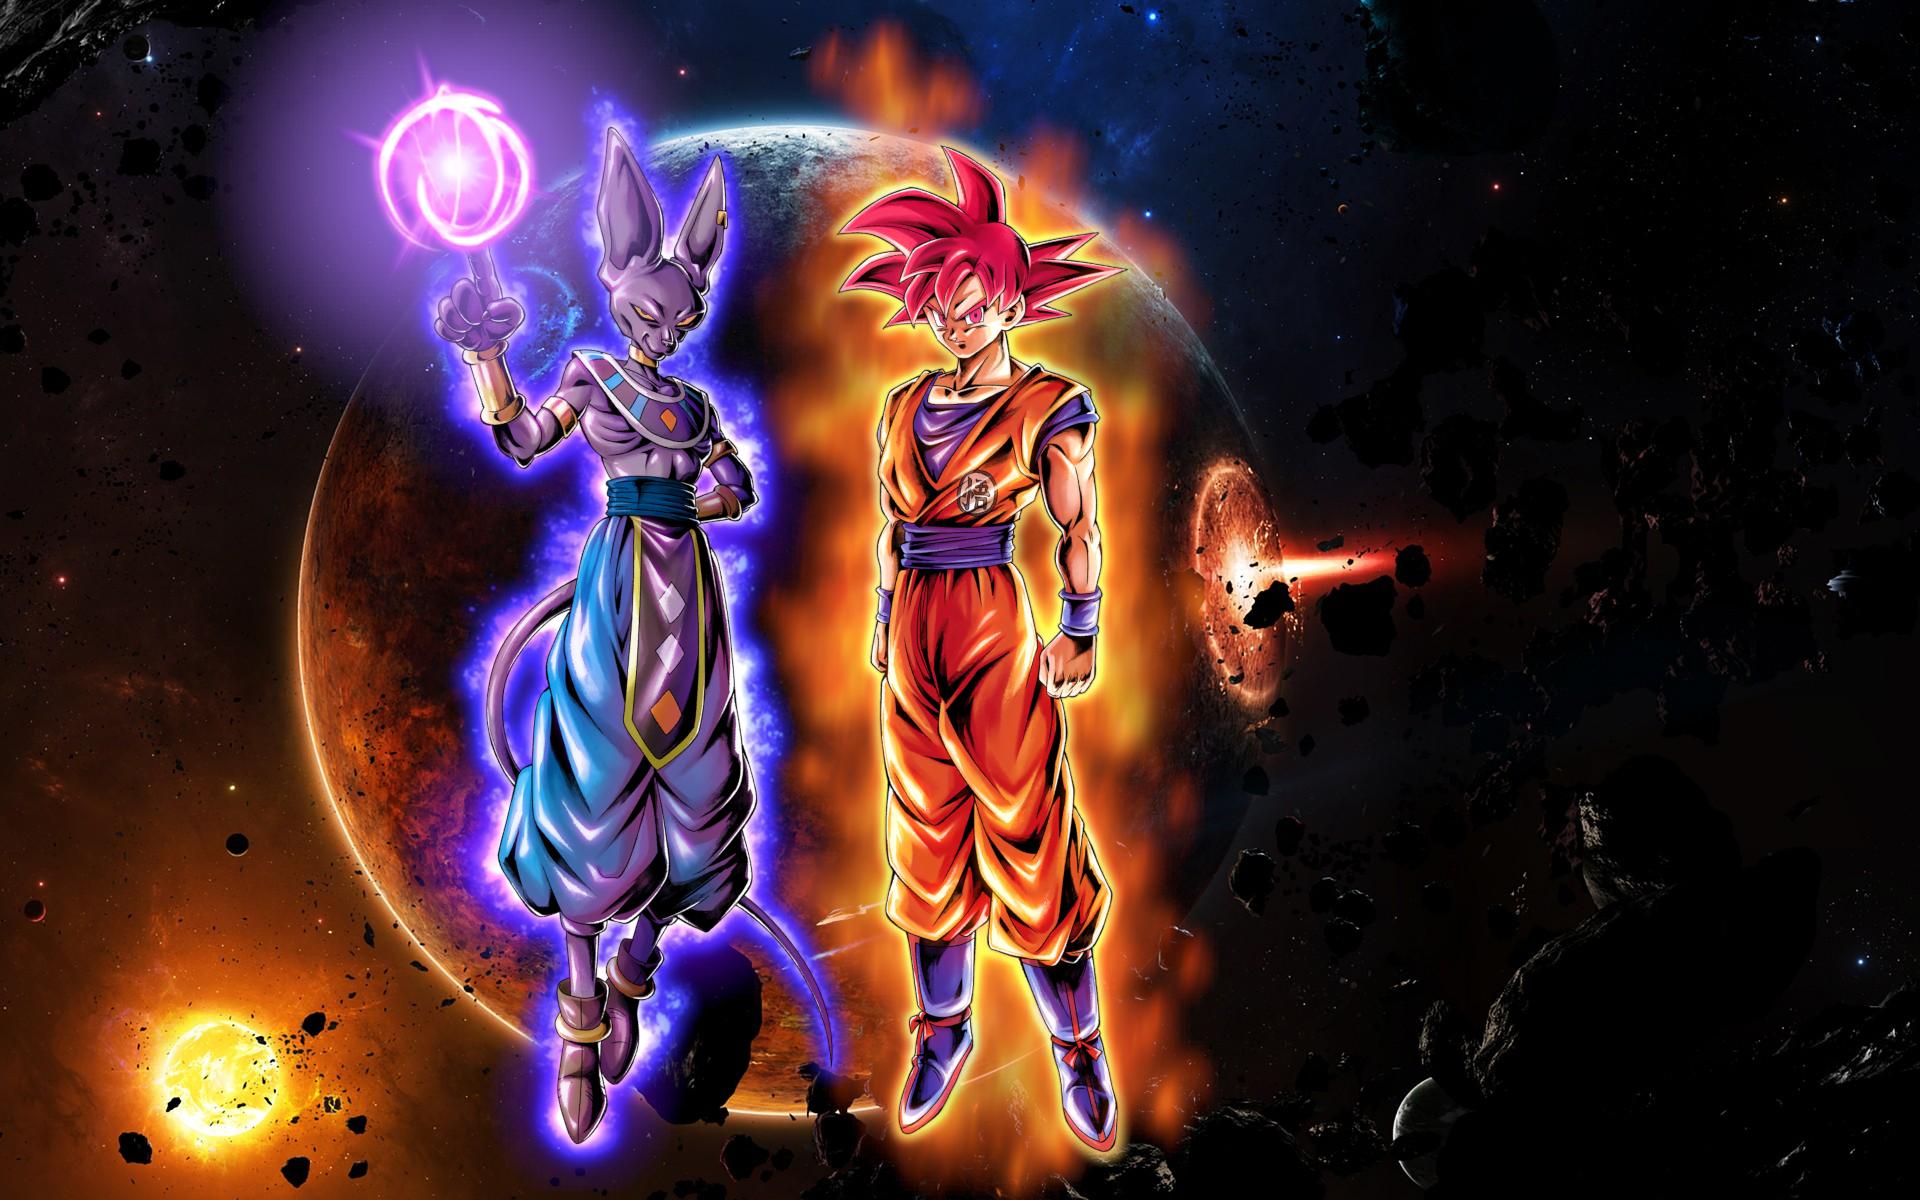 Artbeerus Vs Goku Wallpaper Beerus Vs Goku Background